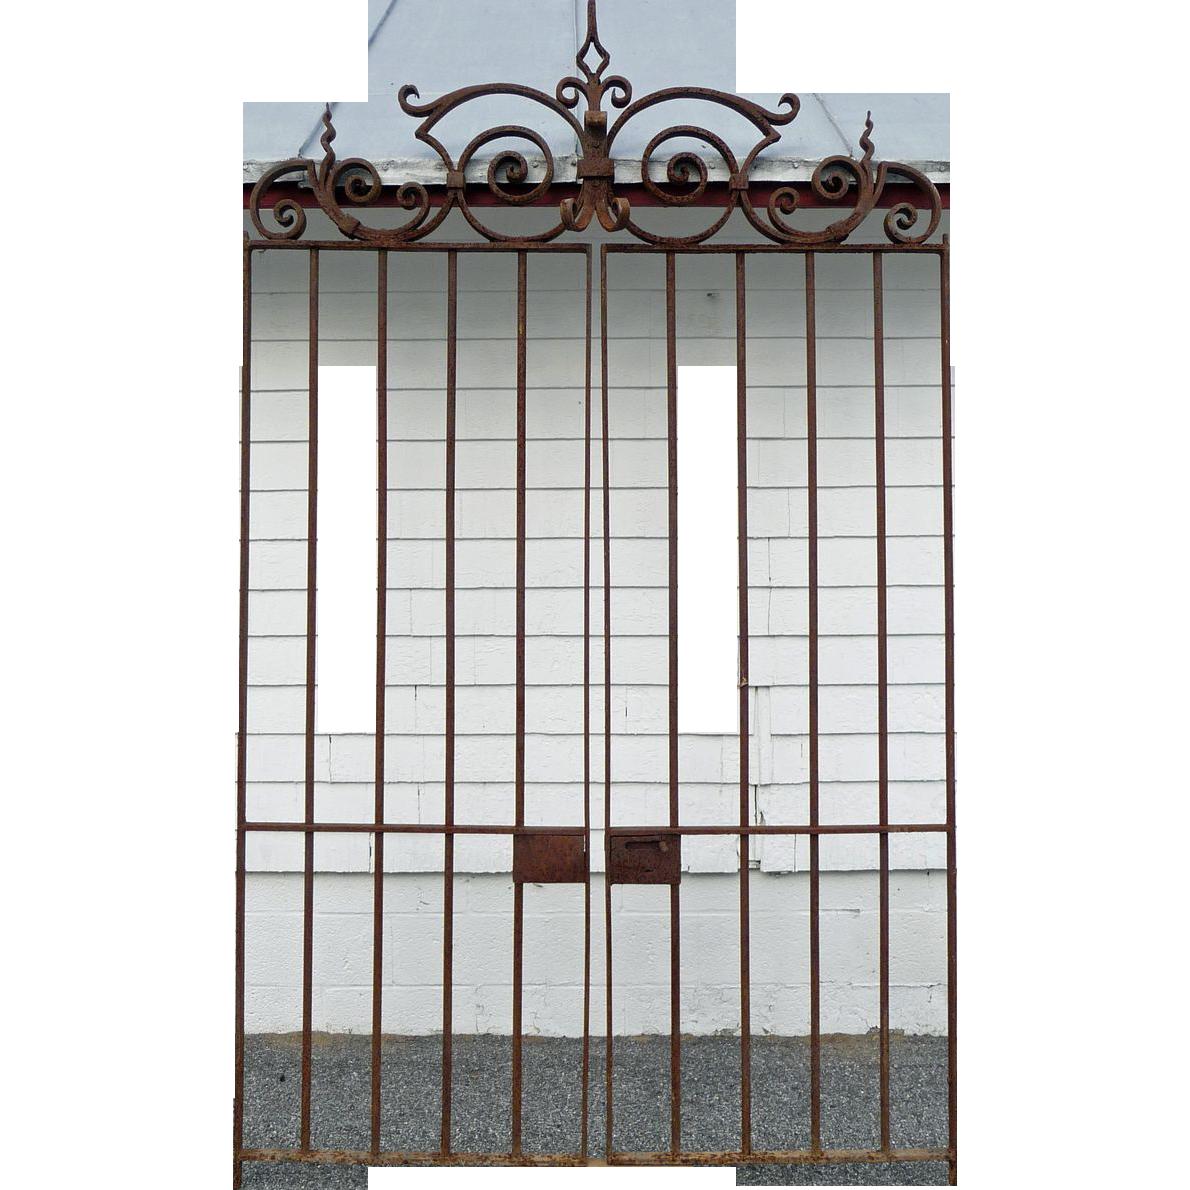 Wrought iron garden gates 19th century baltimore dixon s antiques ruby lane